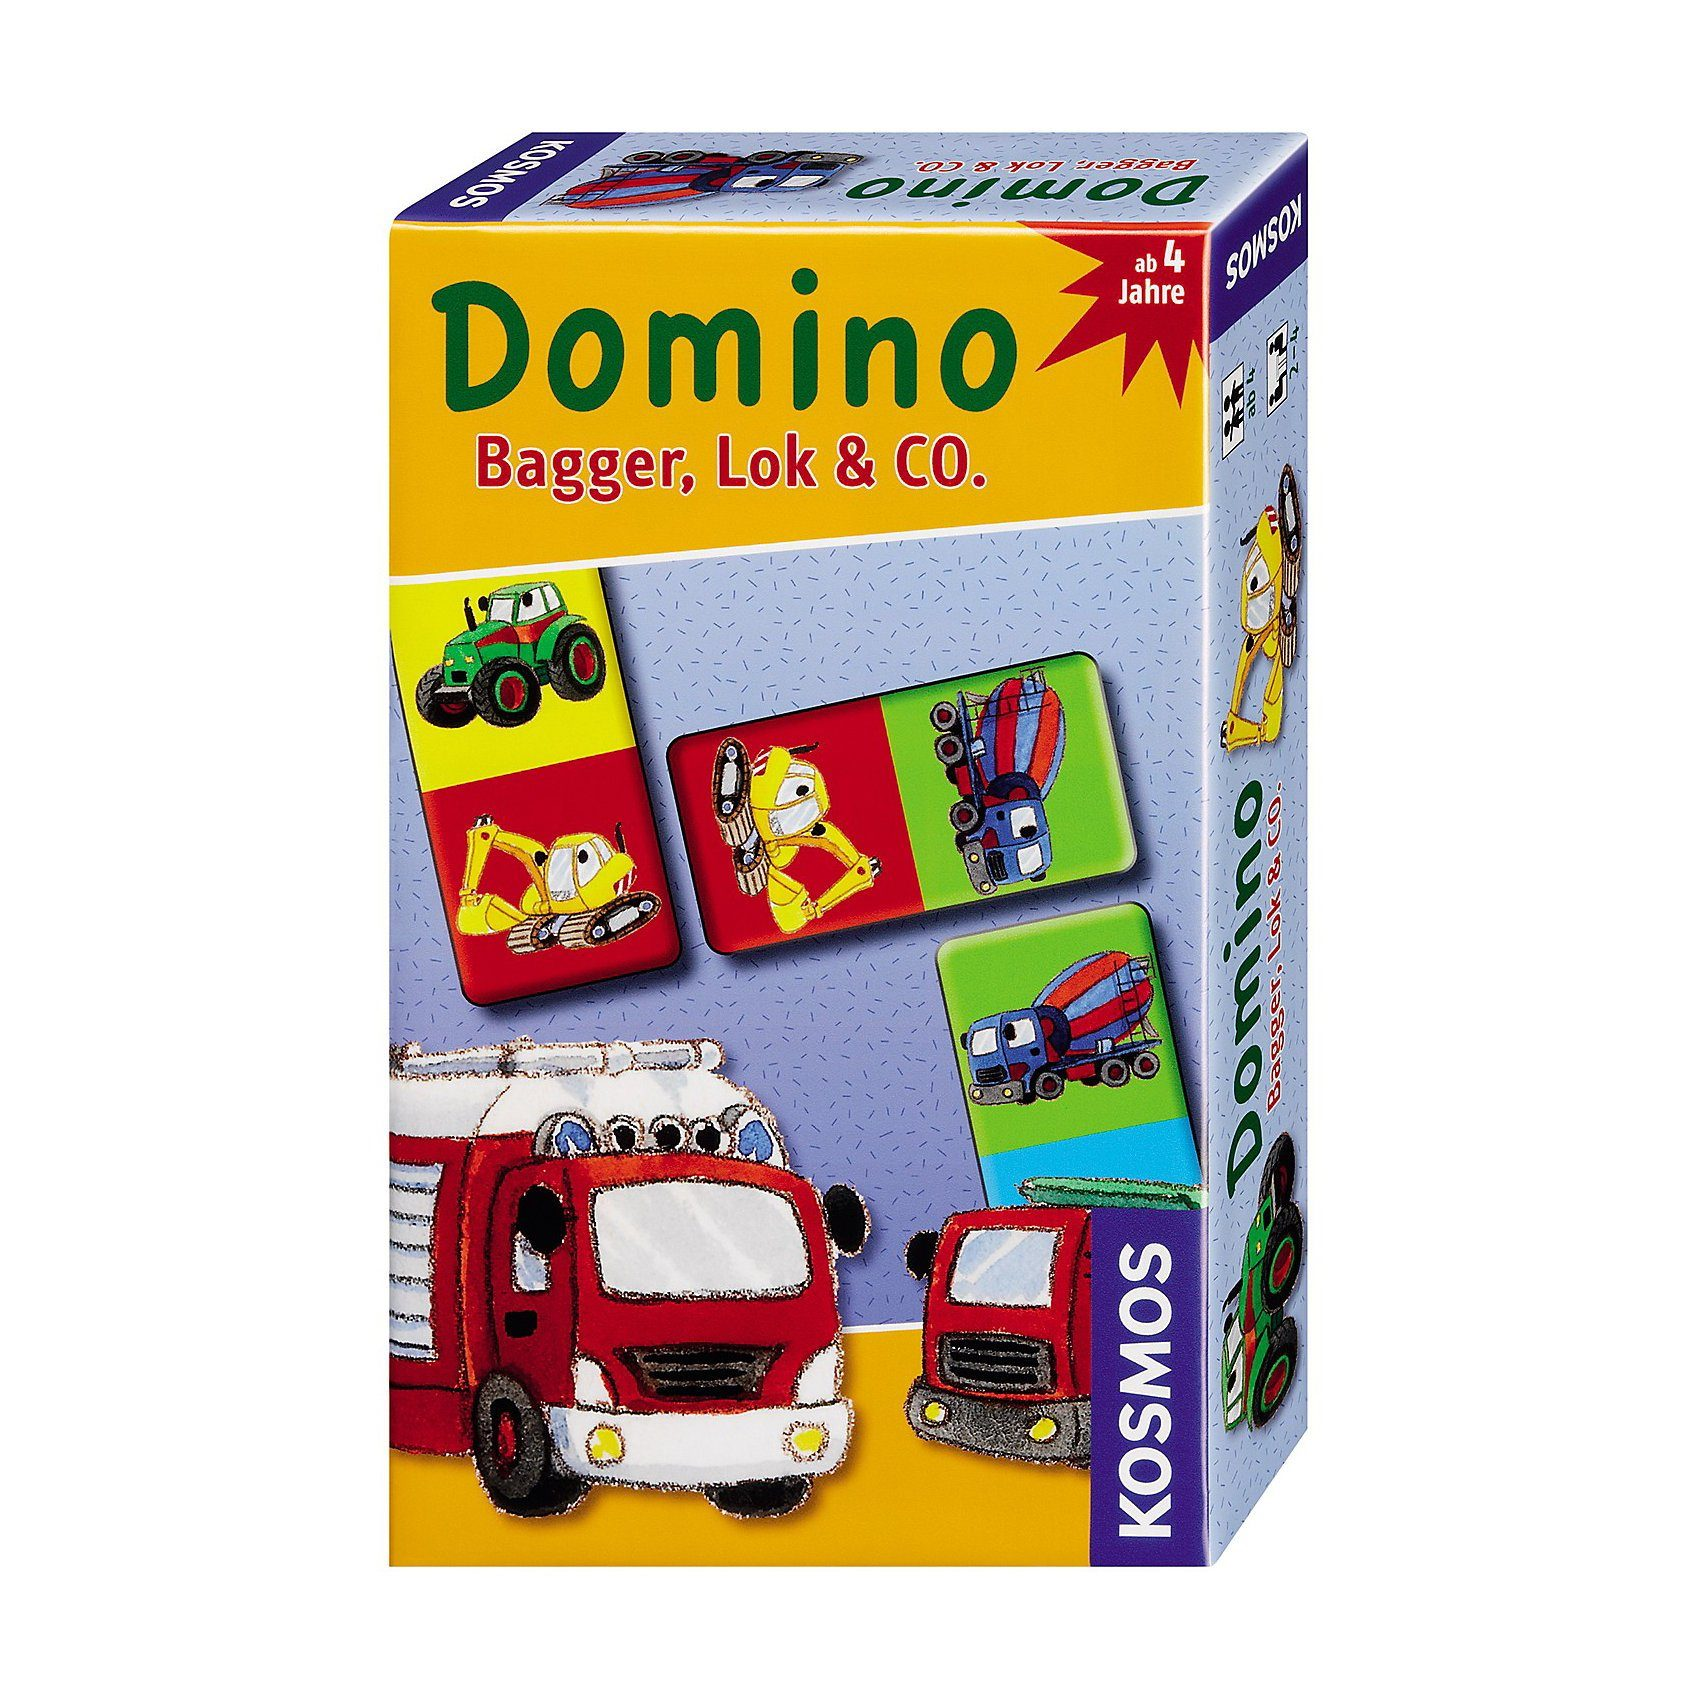 Kosmos Domino Bagger, Lok & Co.